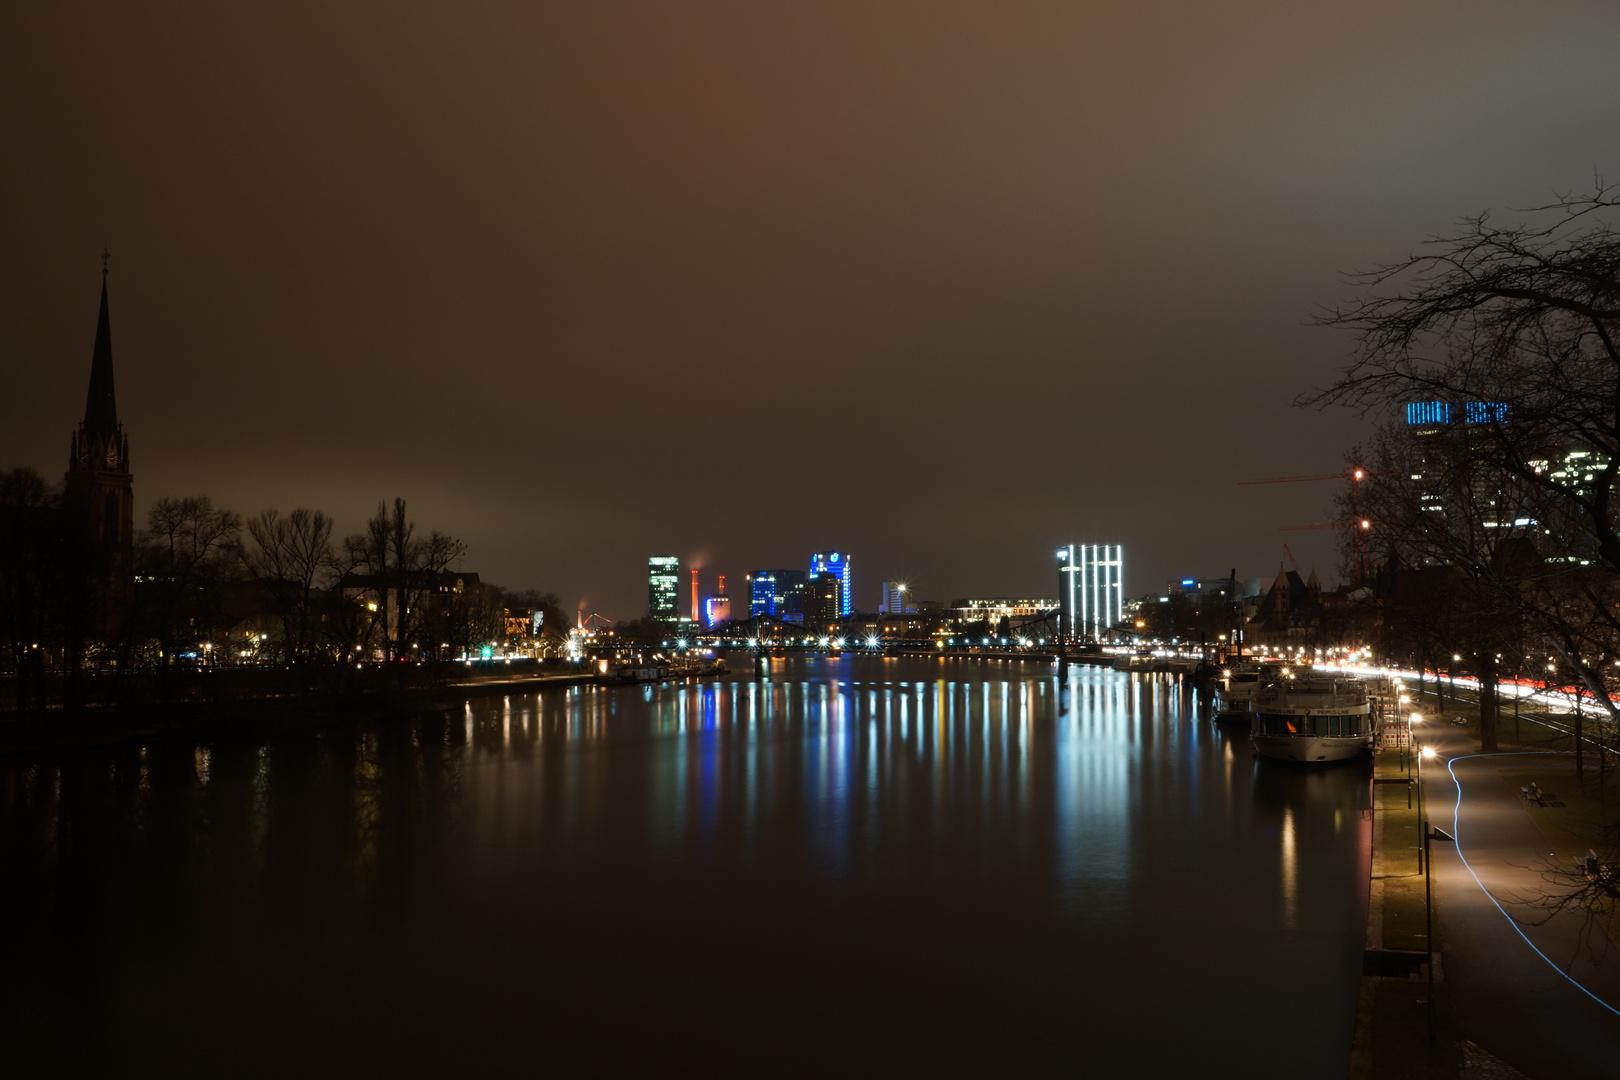 Fotopraxis - Frankfurt a. M. bei Nacht 1